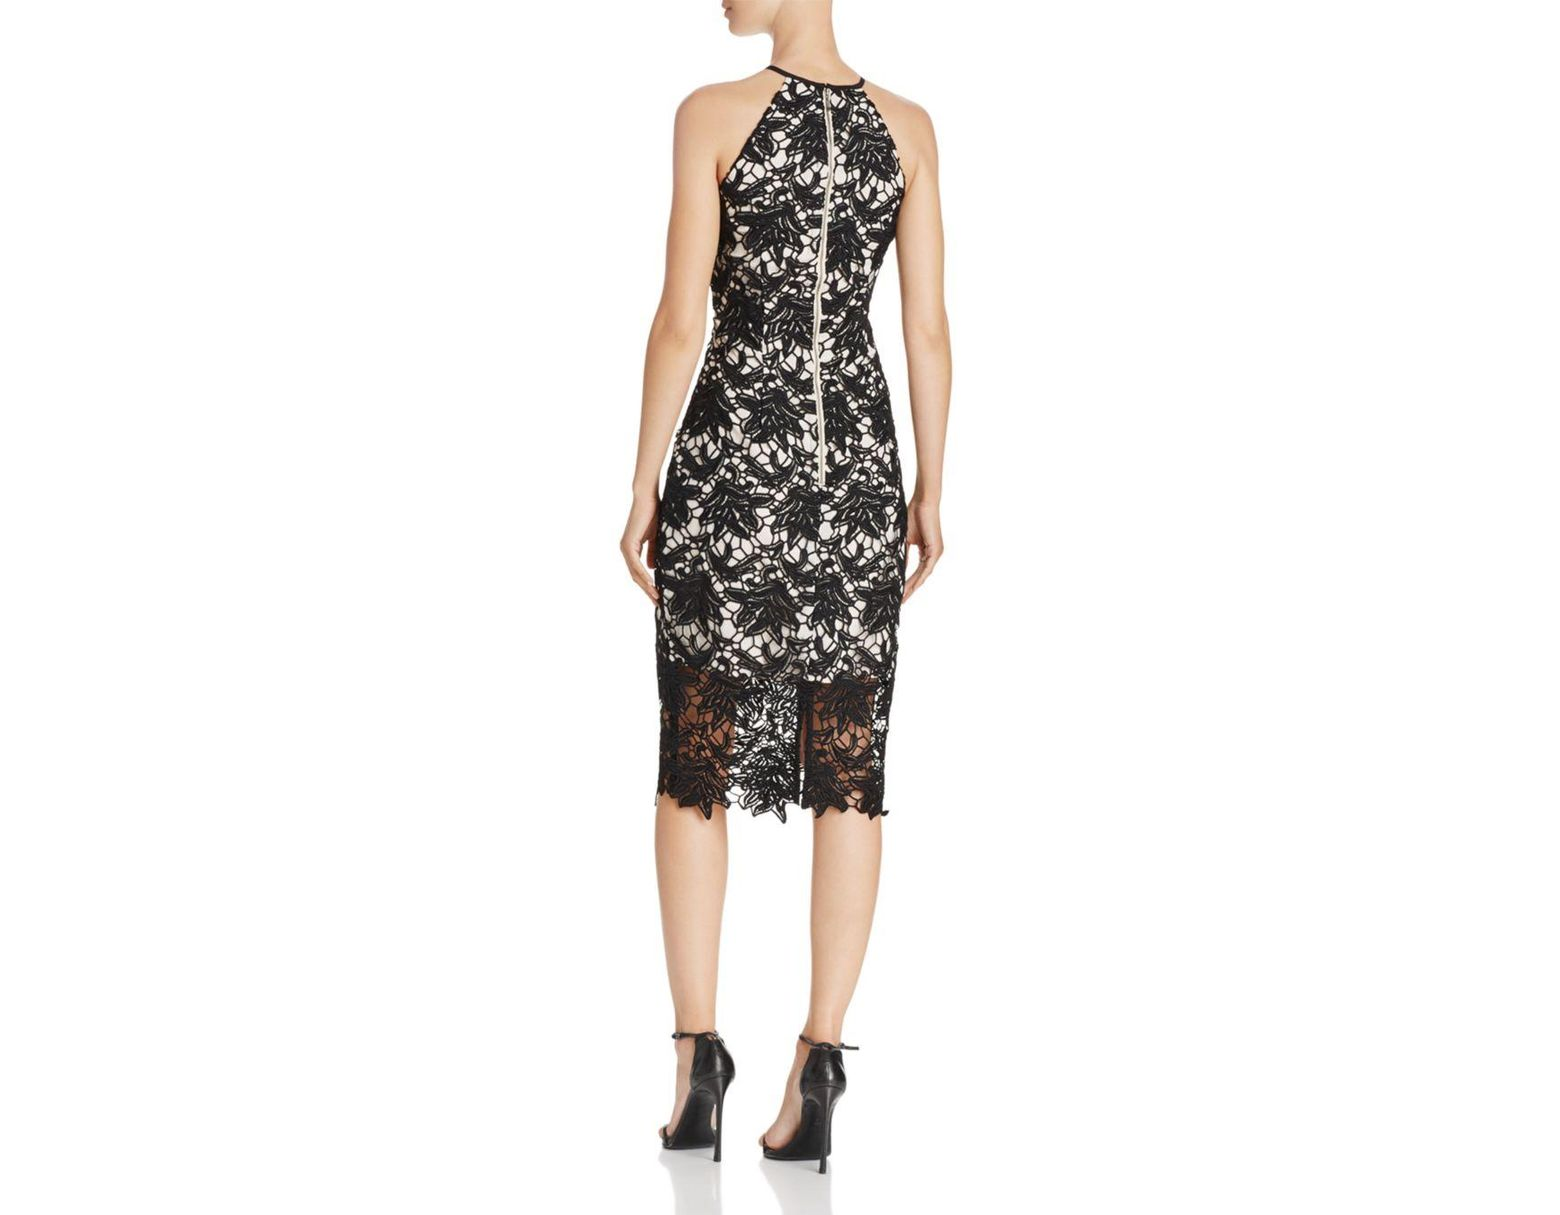 6edd495650d Lyst - Keepsake True Love Lace Dress in Black - Save 84%